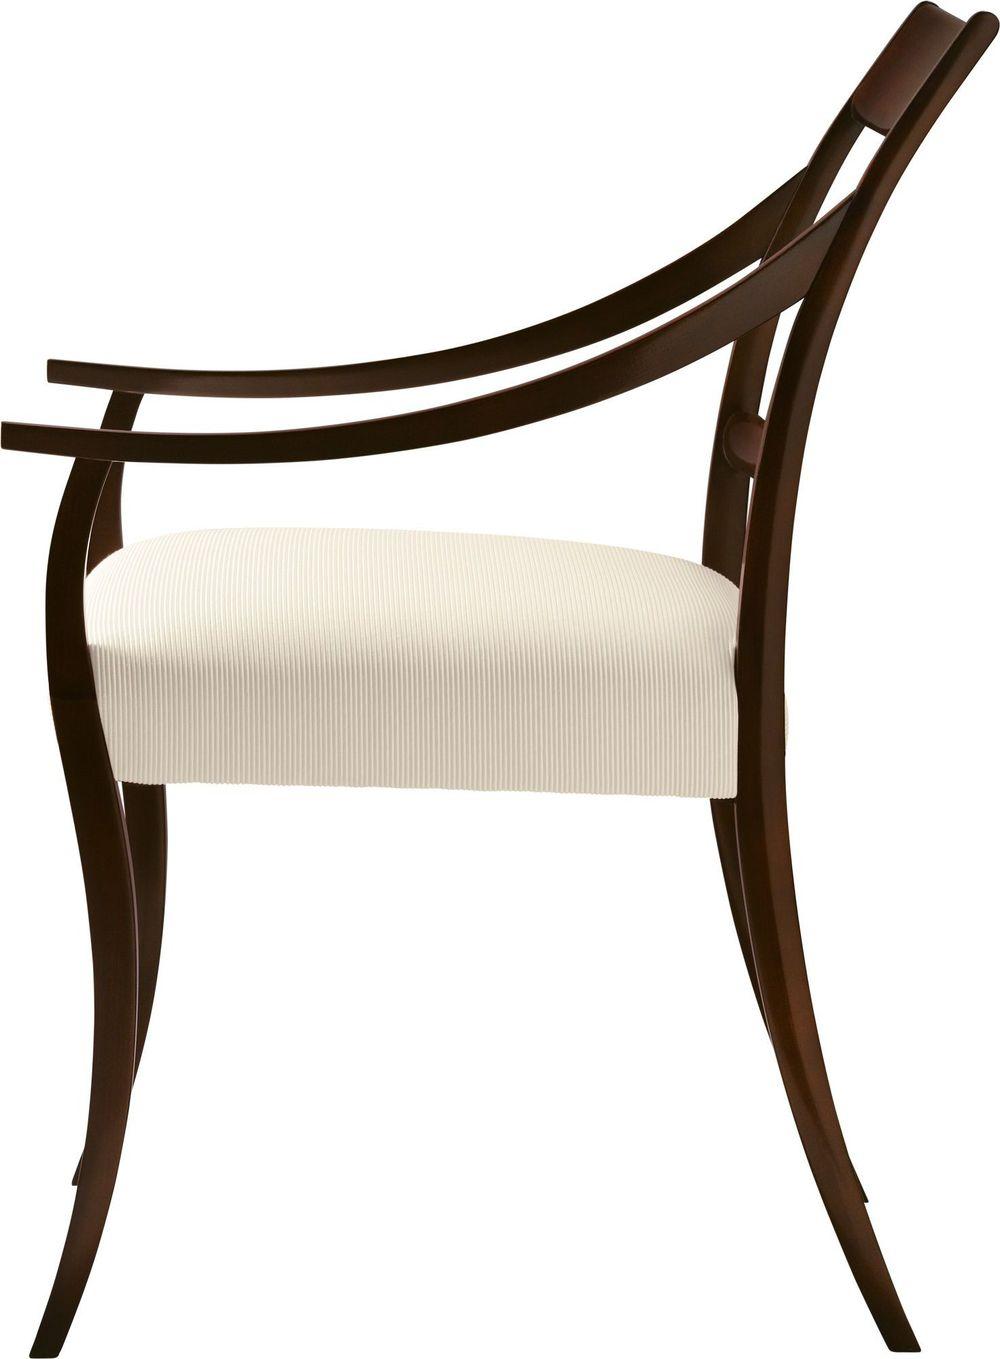 Baker Furniture - Maharadja Chair